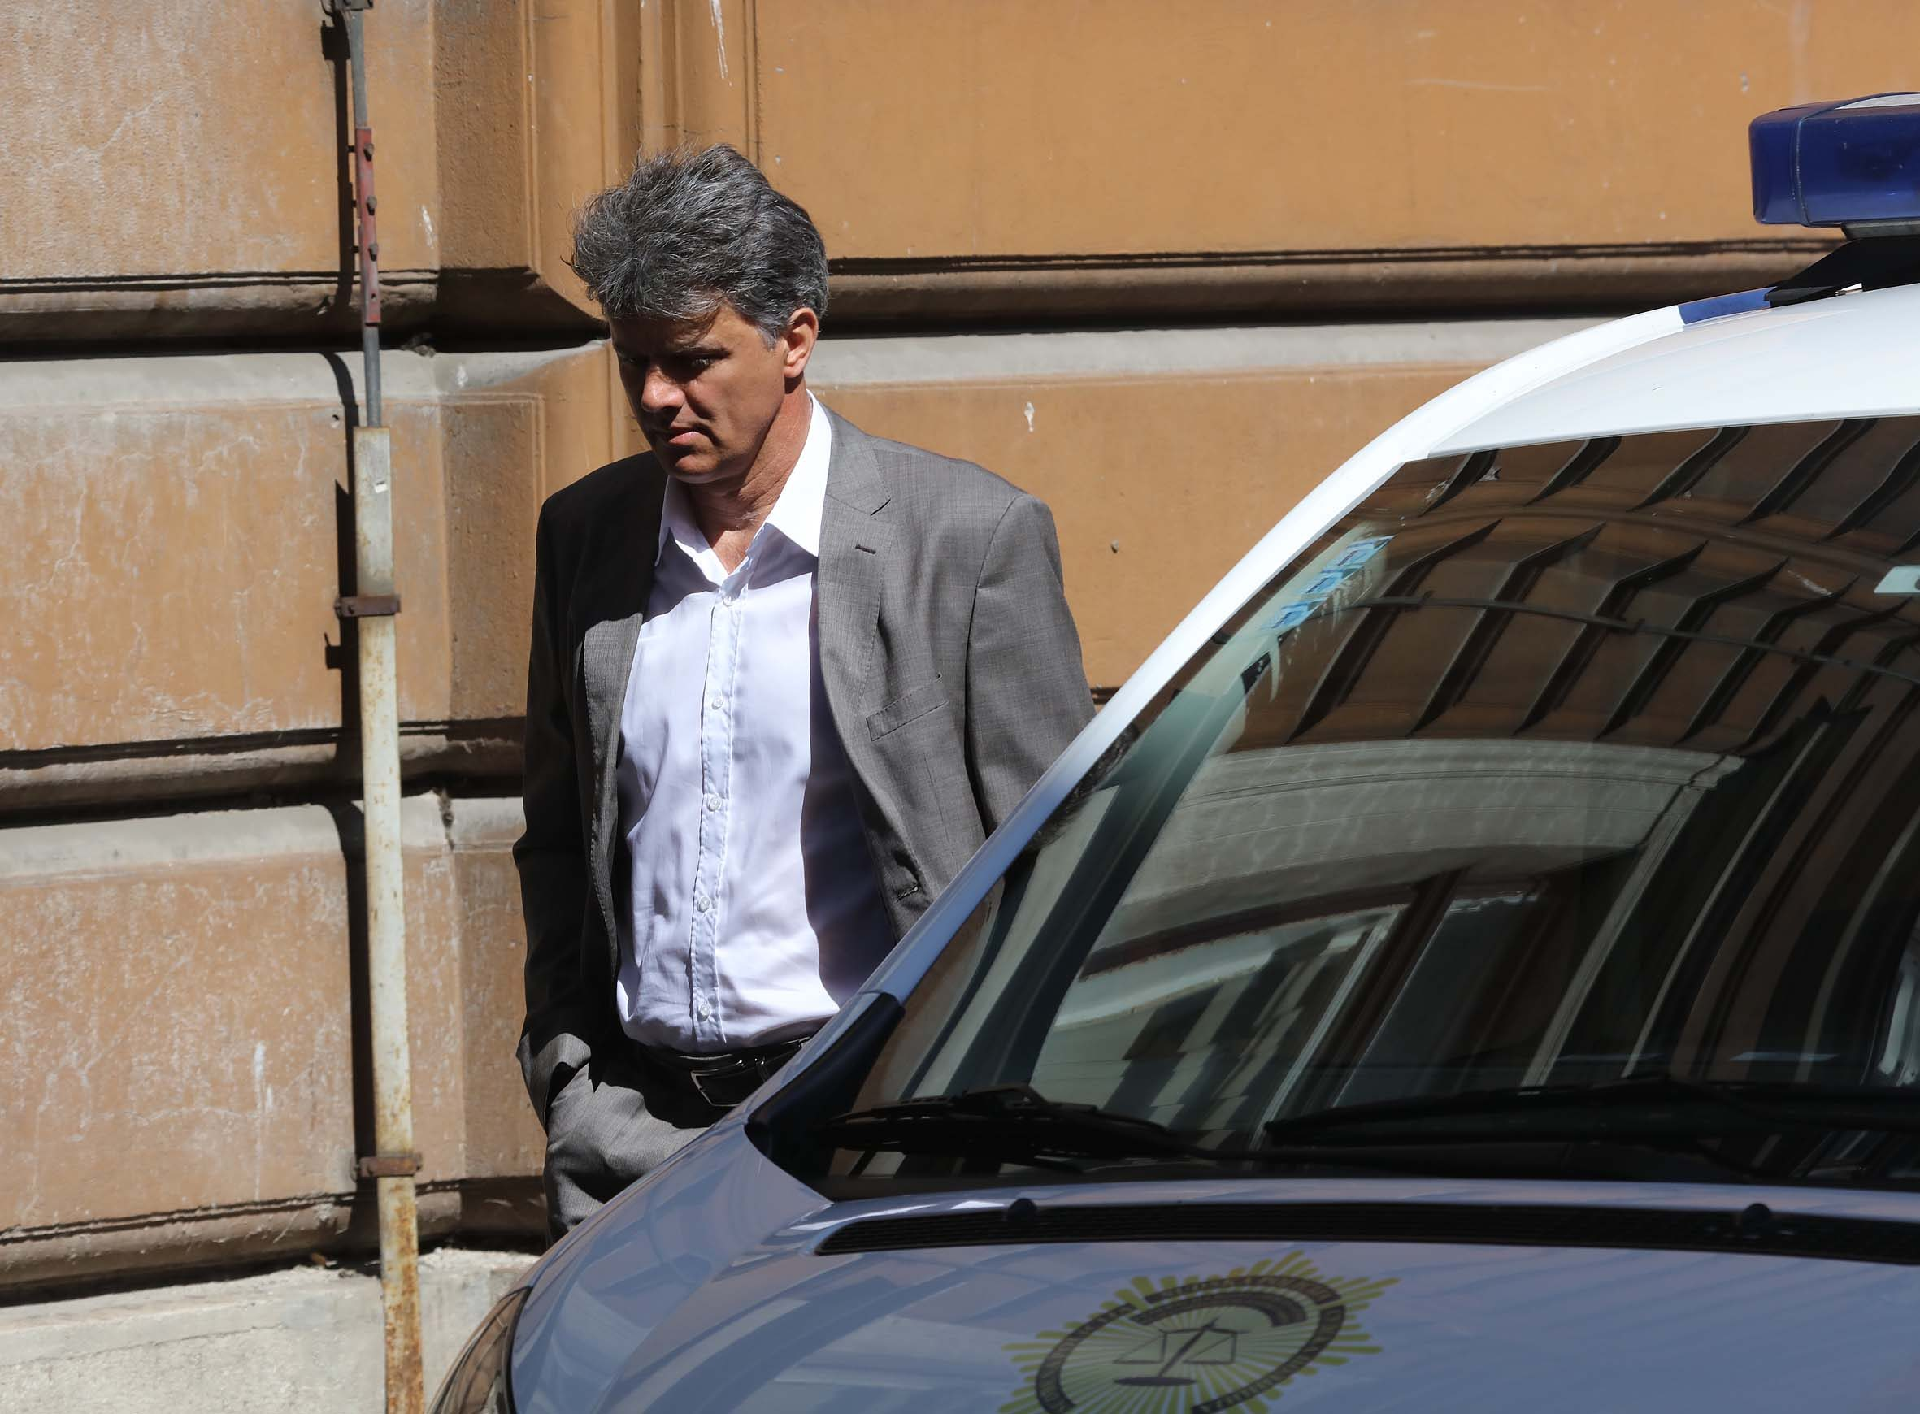 Optužba presretnutim razgovorima dokazuje Džananovićev položaj